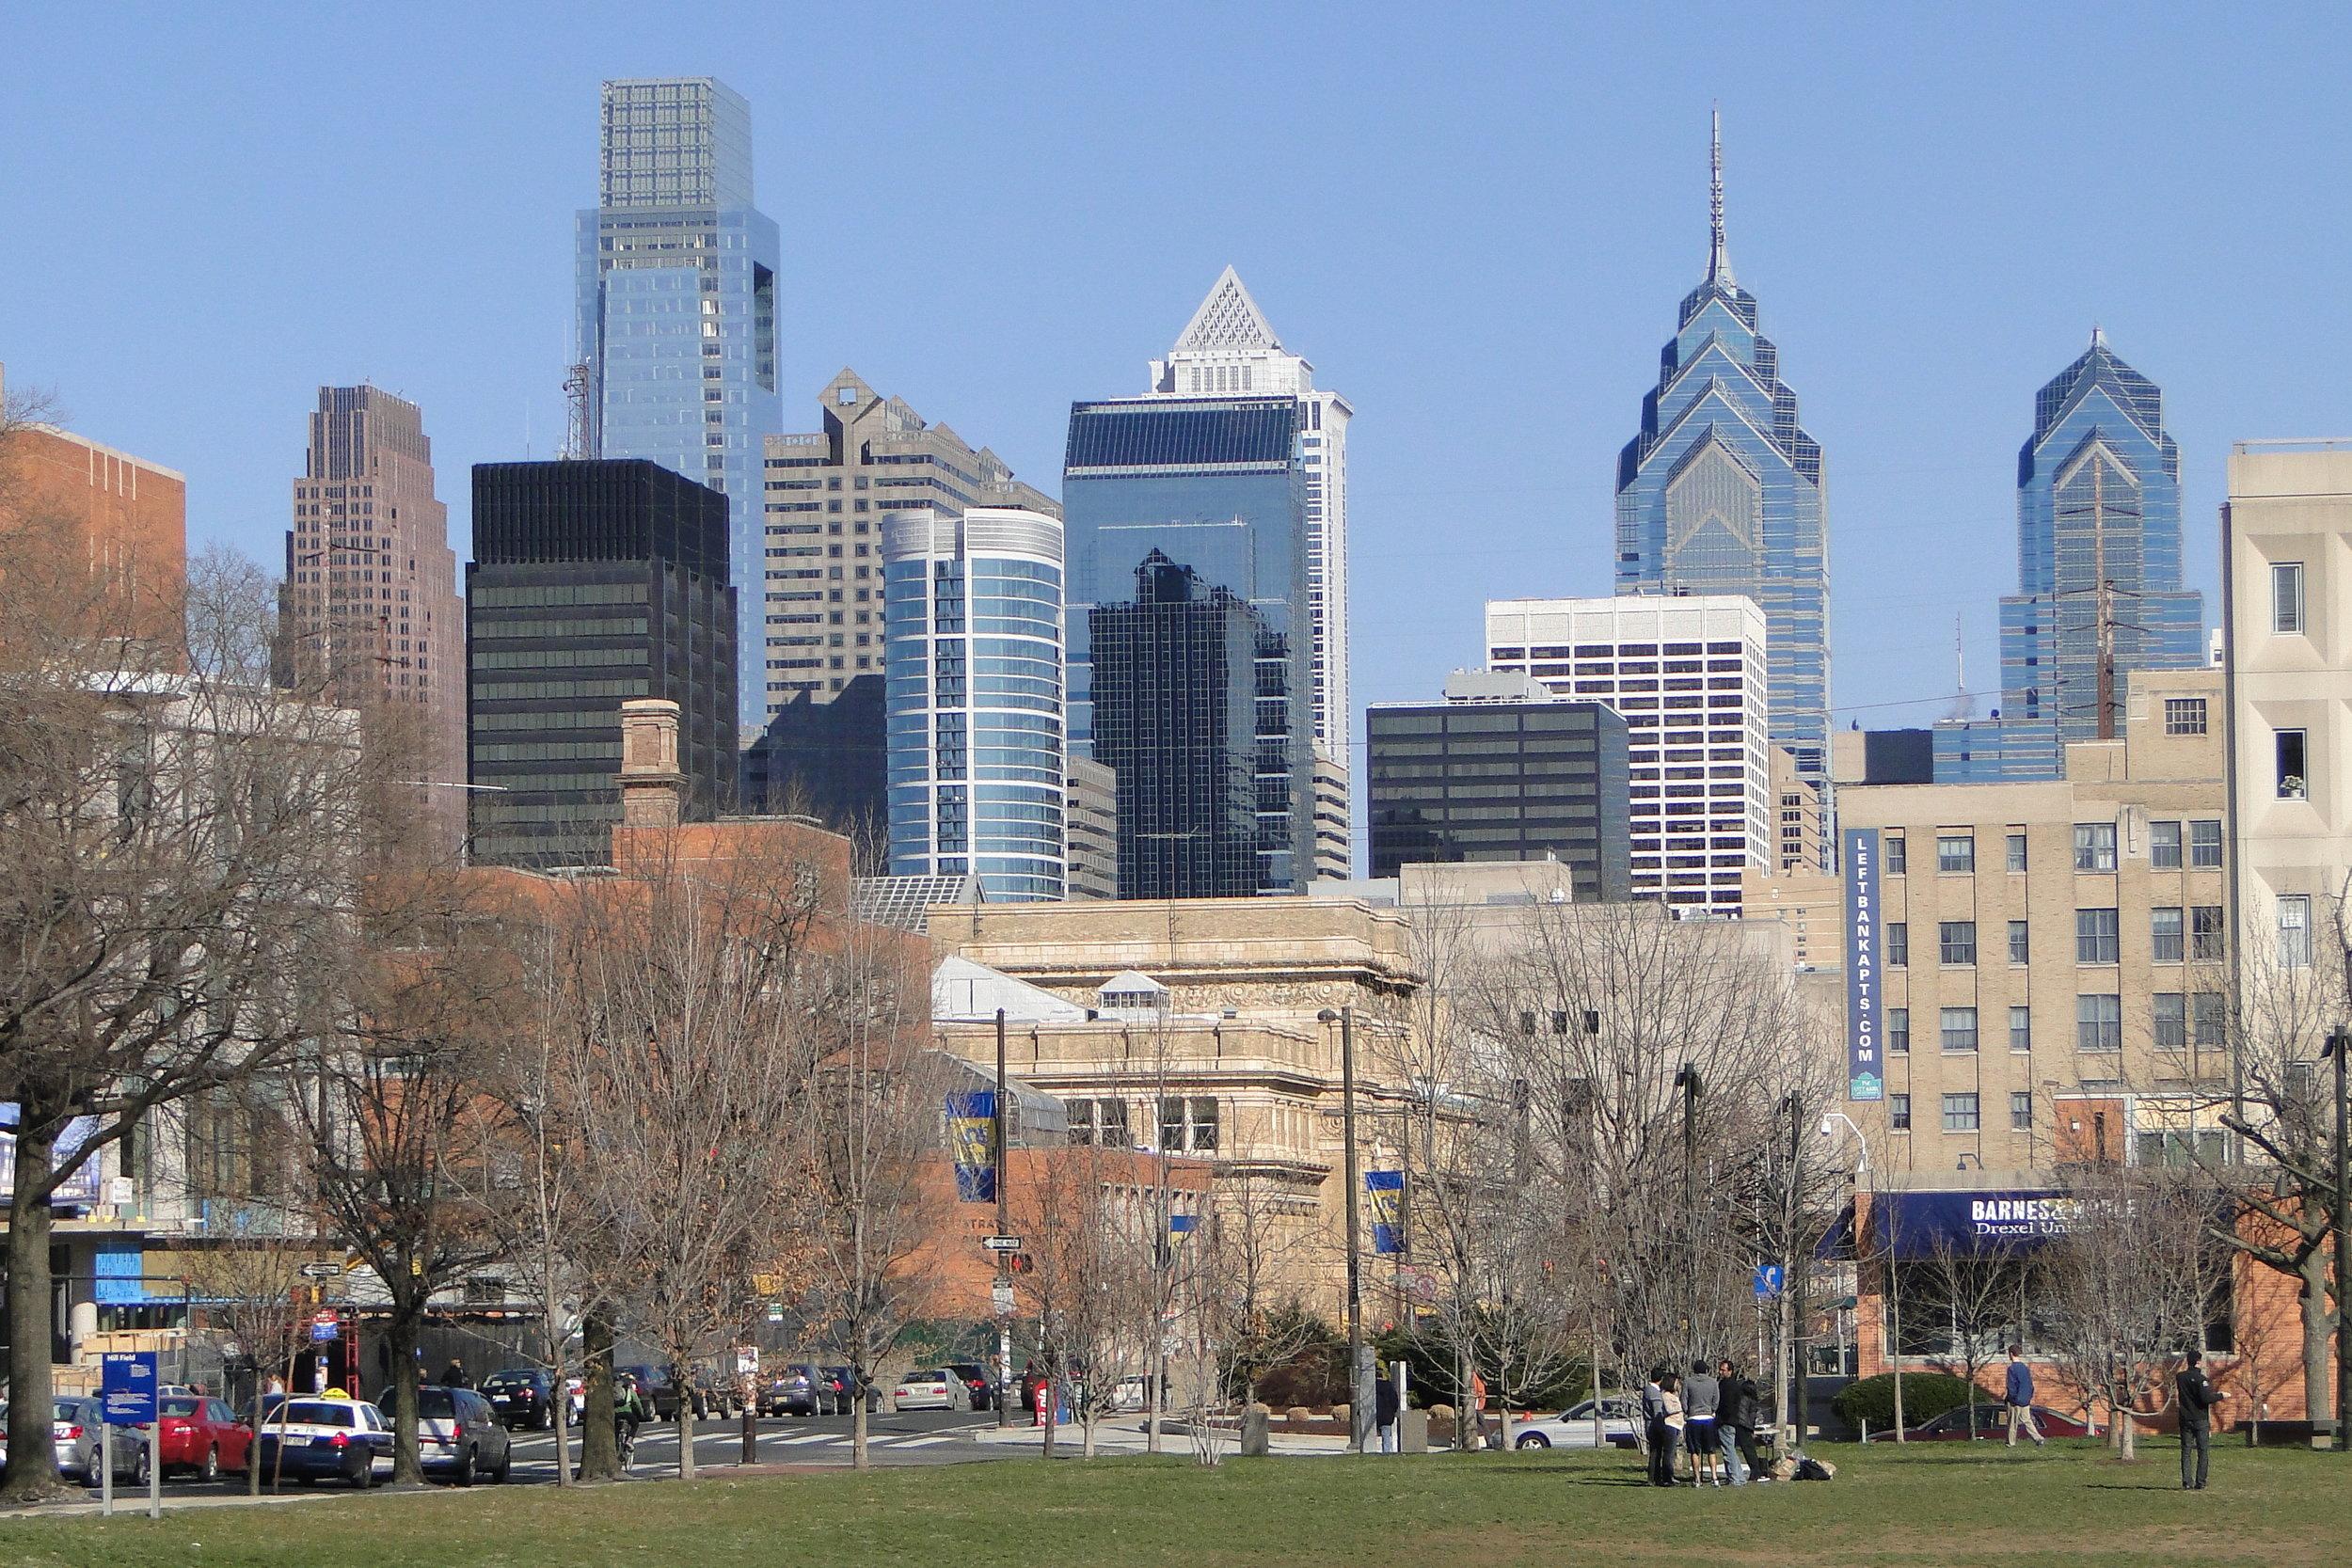 View_of_Philadelphia_Skyline_from_University_of_Pennsylvania_Downtown_Campus_-_Philadelphia_-_Pennsylvania.jpg